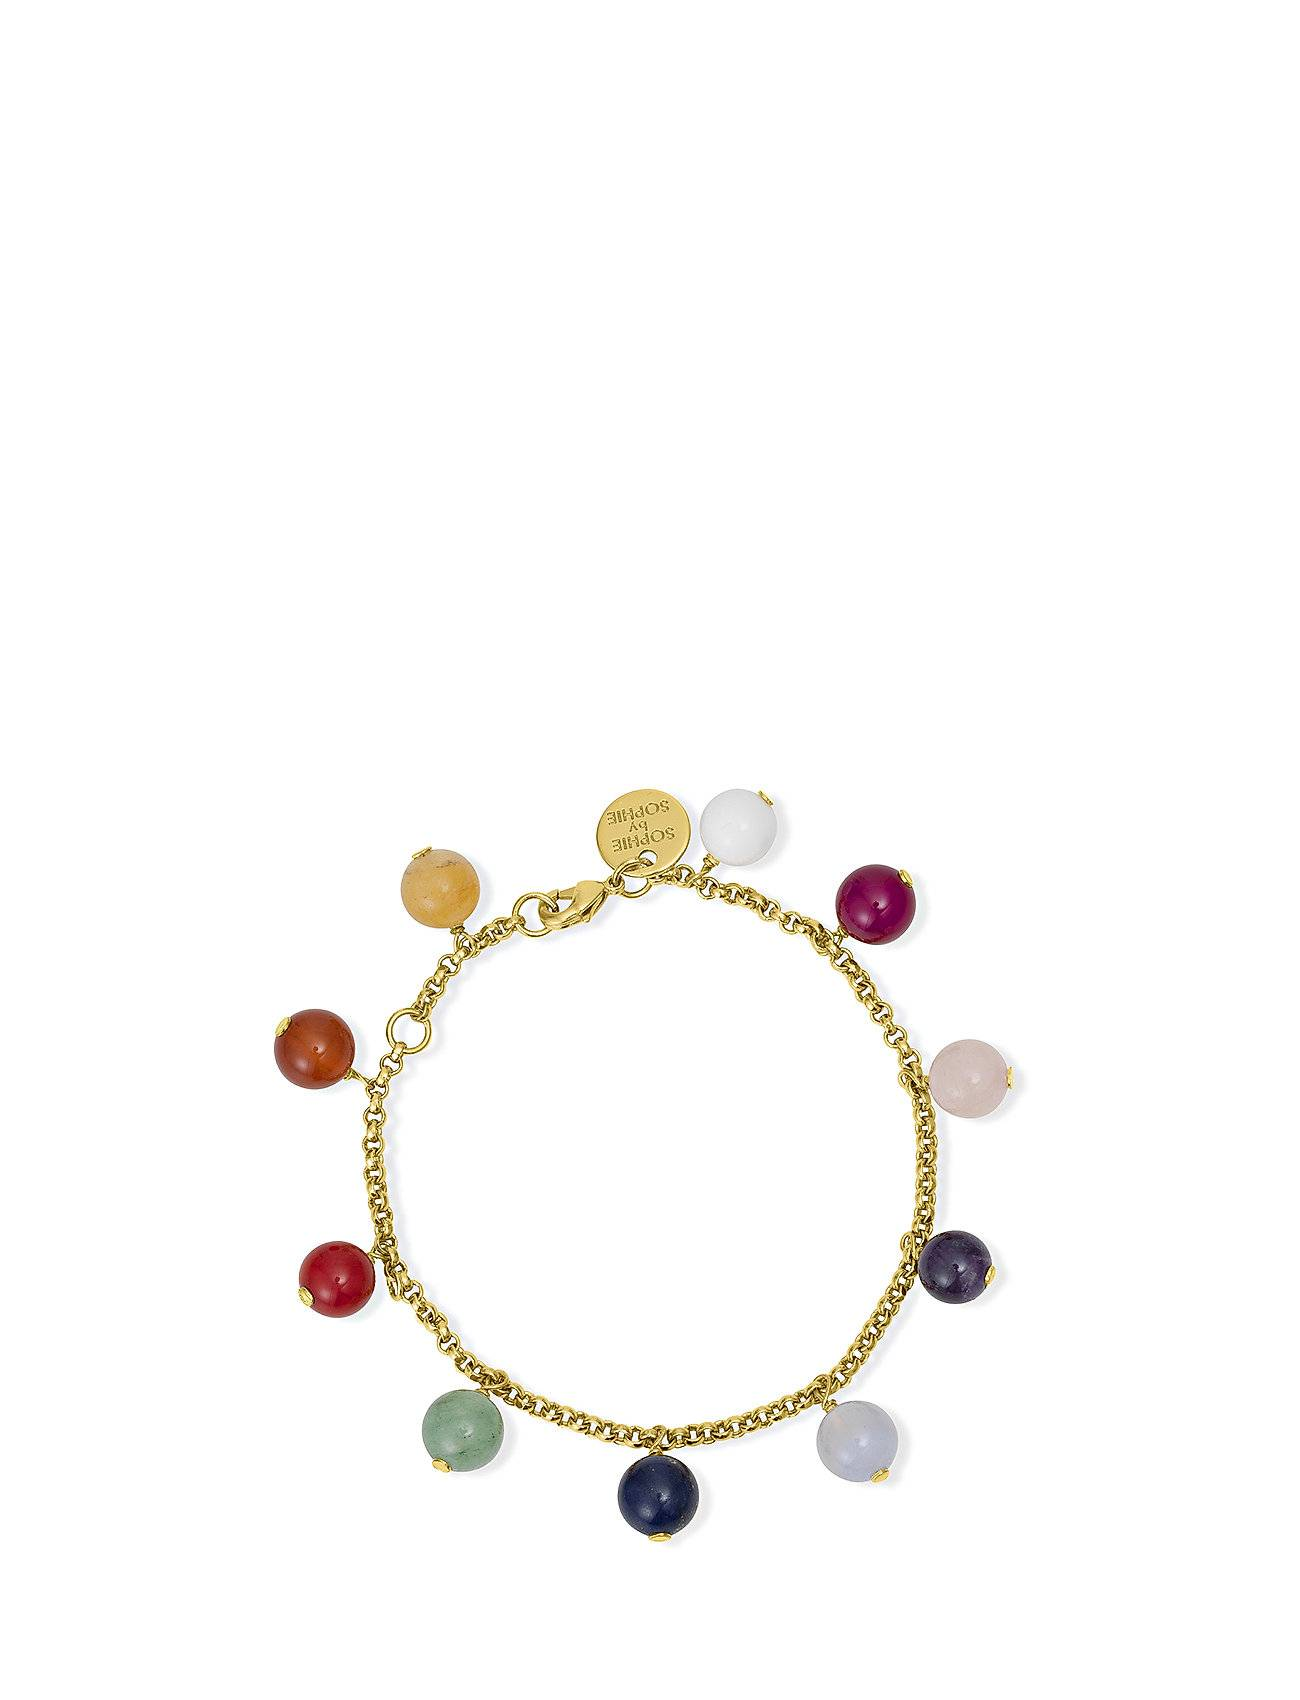 SOPHIE by SOPHIE Childhood Bracelet Accessories Jewellery Bracelets Chain Bracelets Kulta SOPHIE By SOPHIE